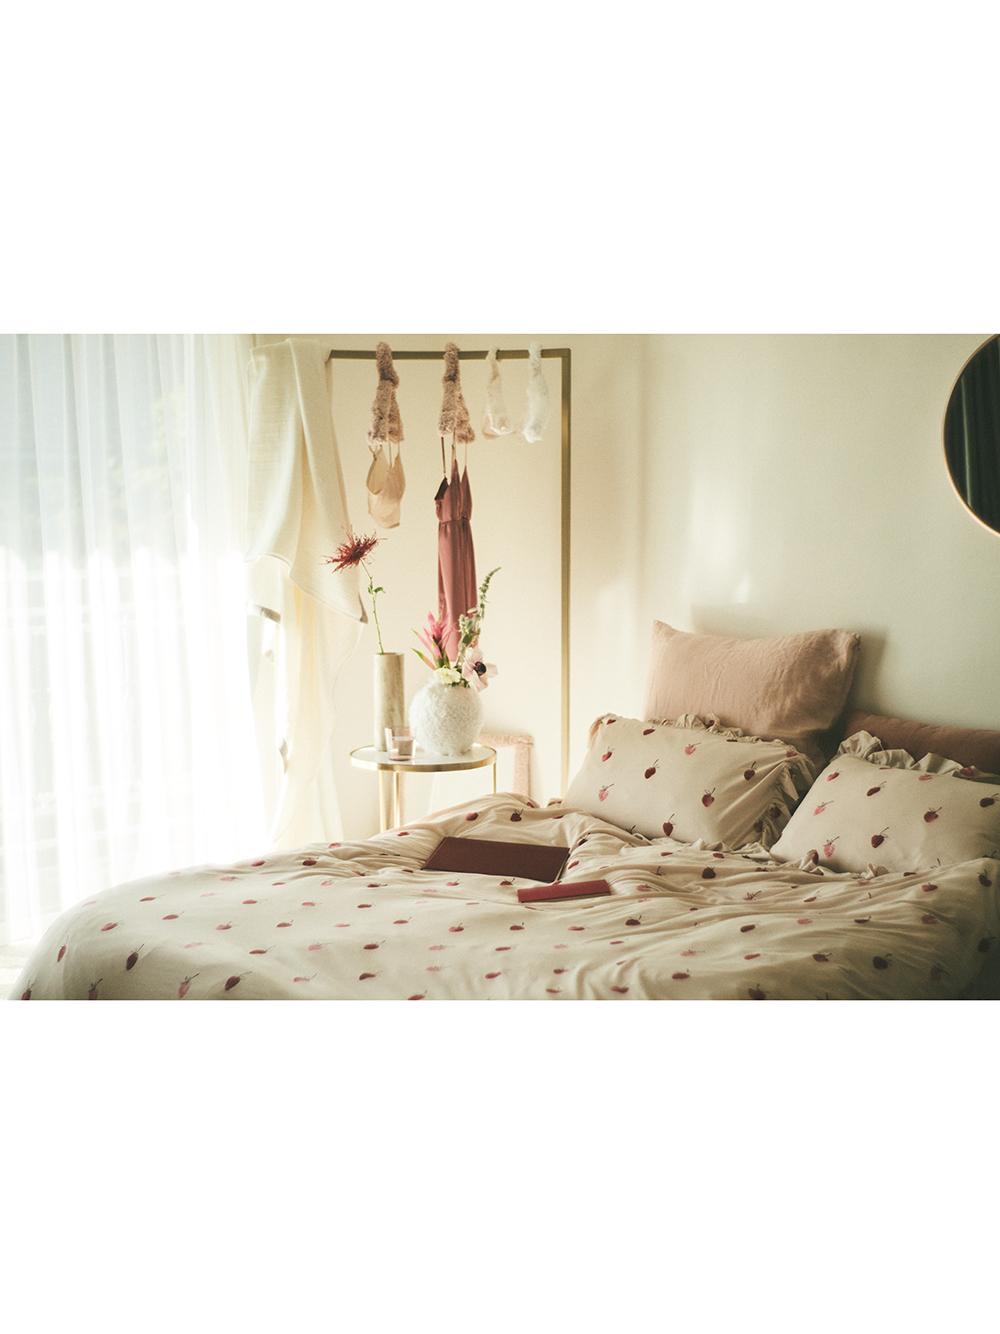 【Sleep】ストロベリーモチーフ枕カバー | PSGG211014